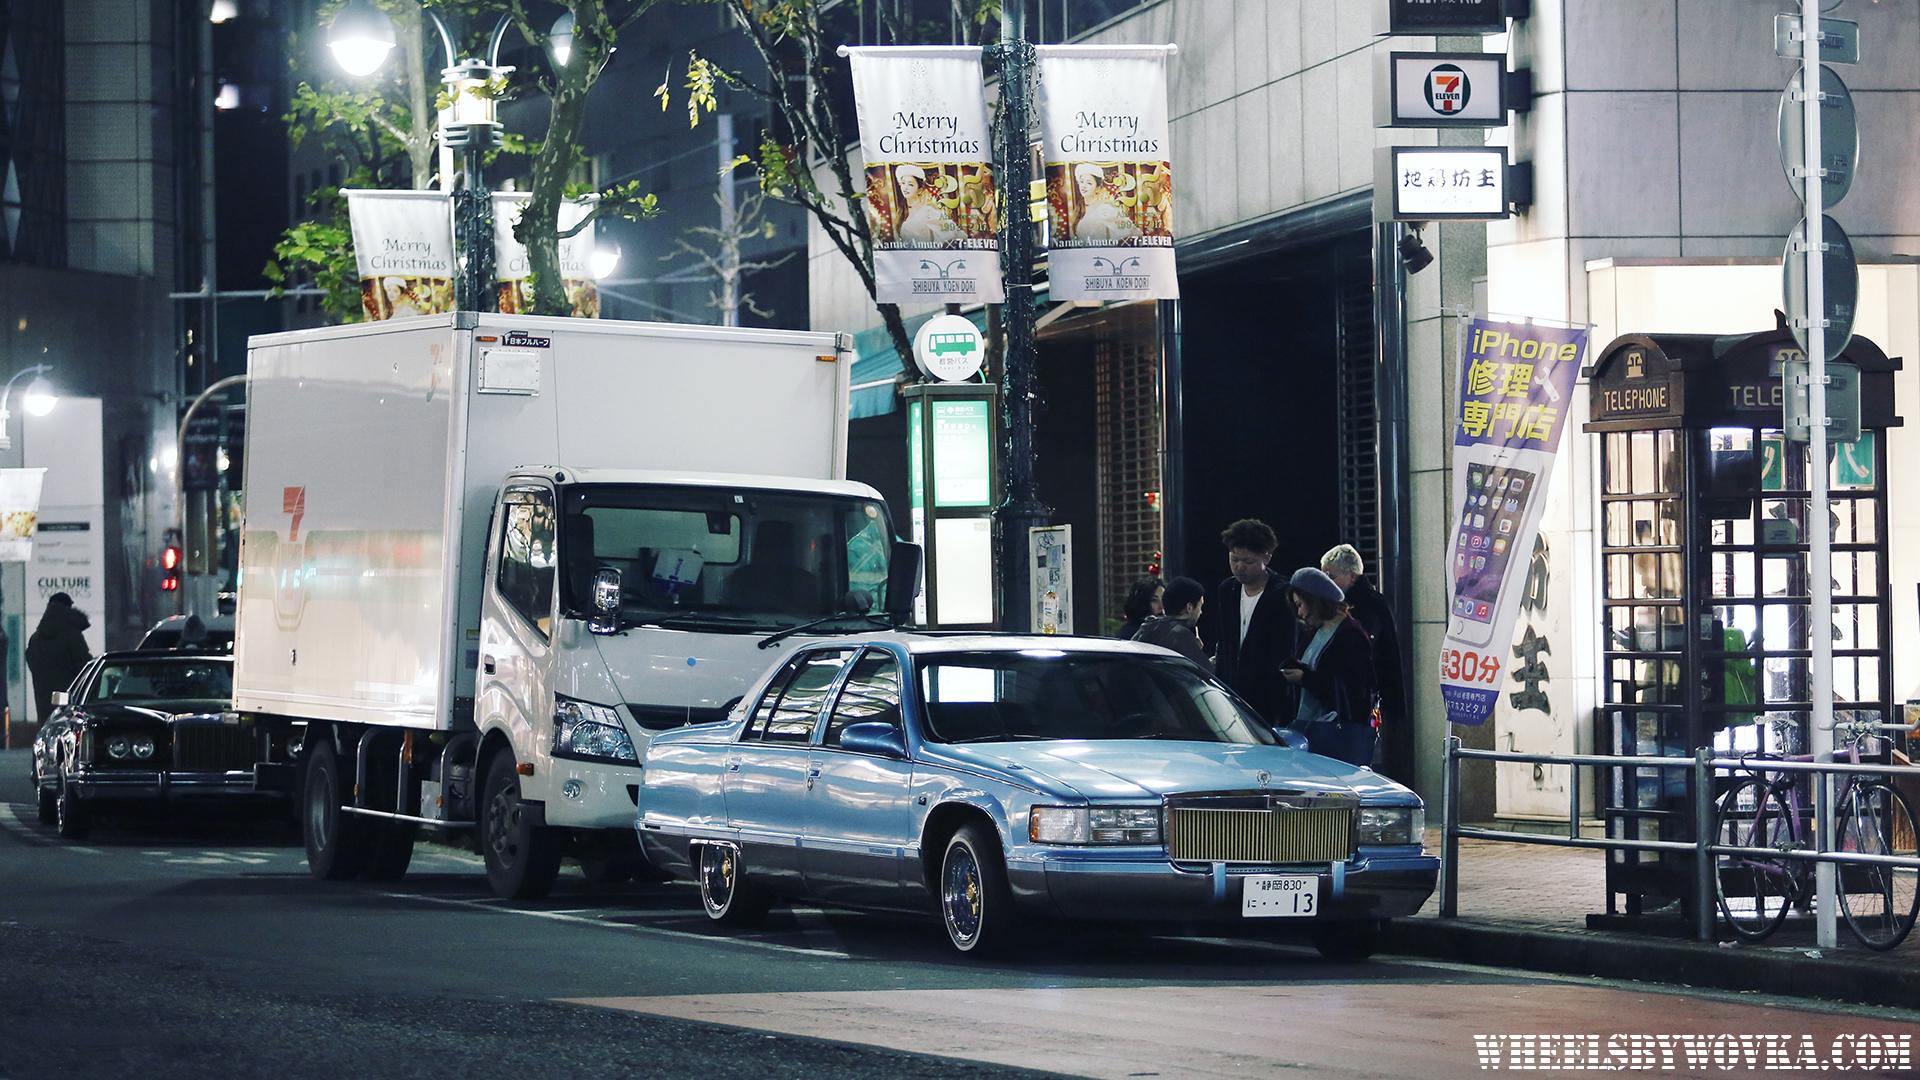 shibuya-japan-tokyo-lowrider-cruise-night-20